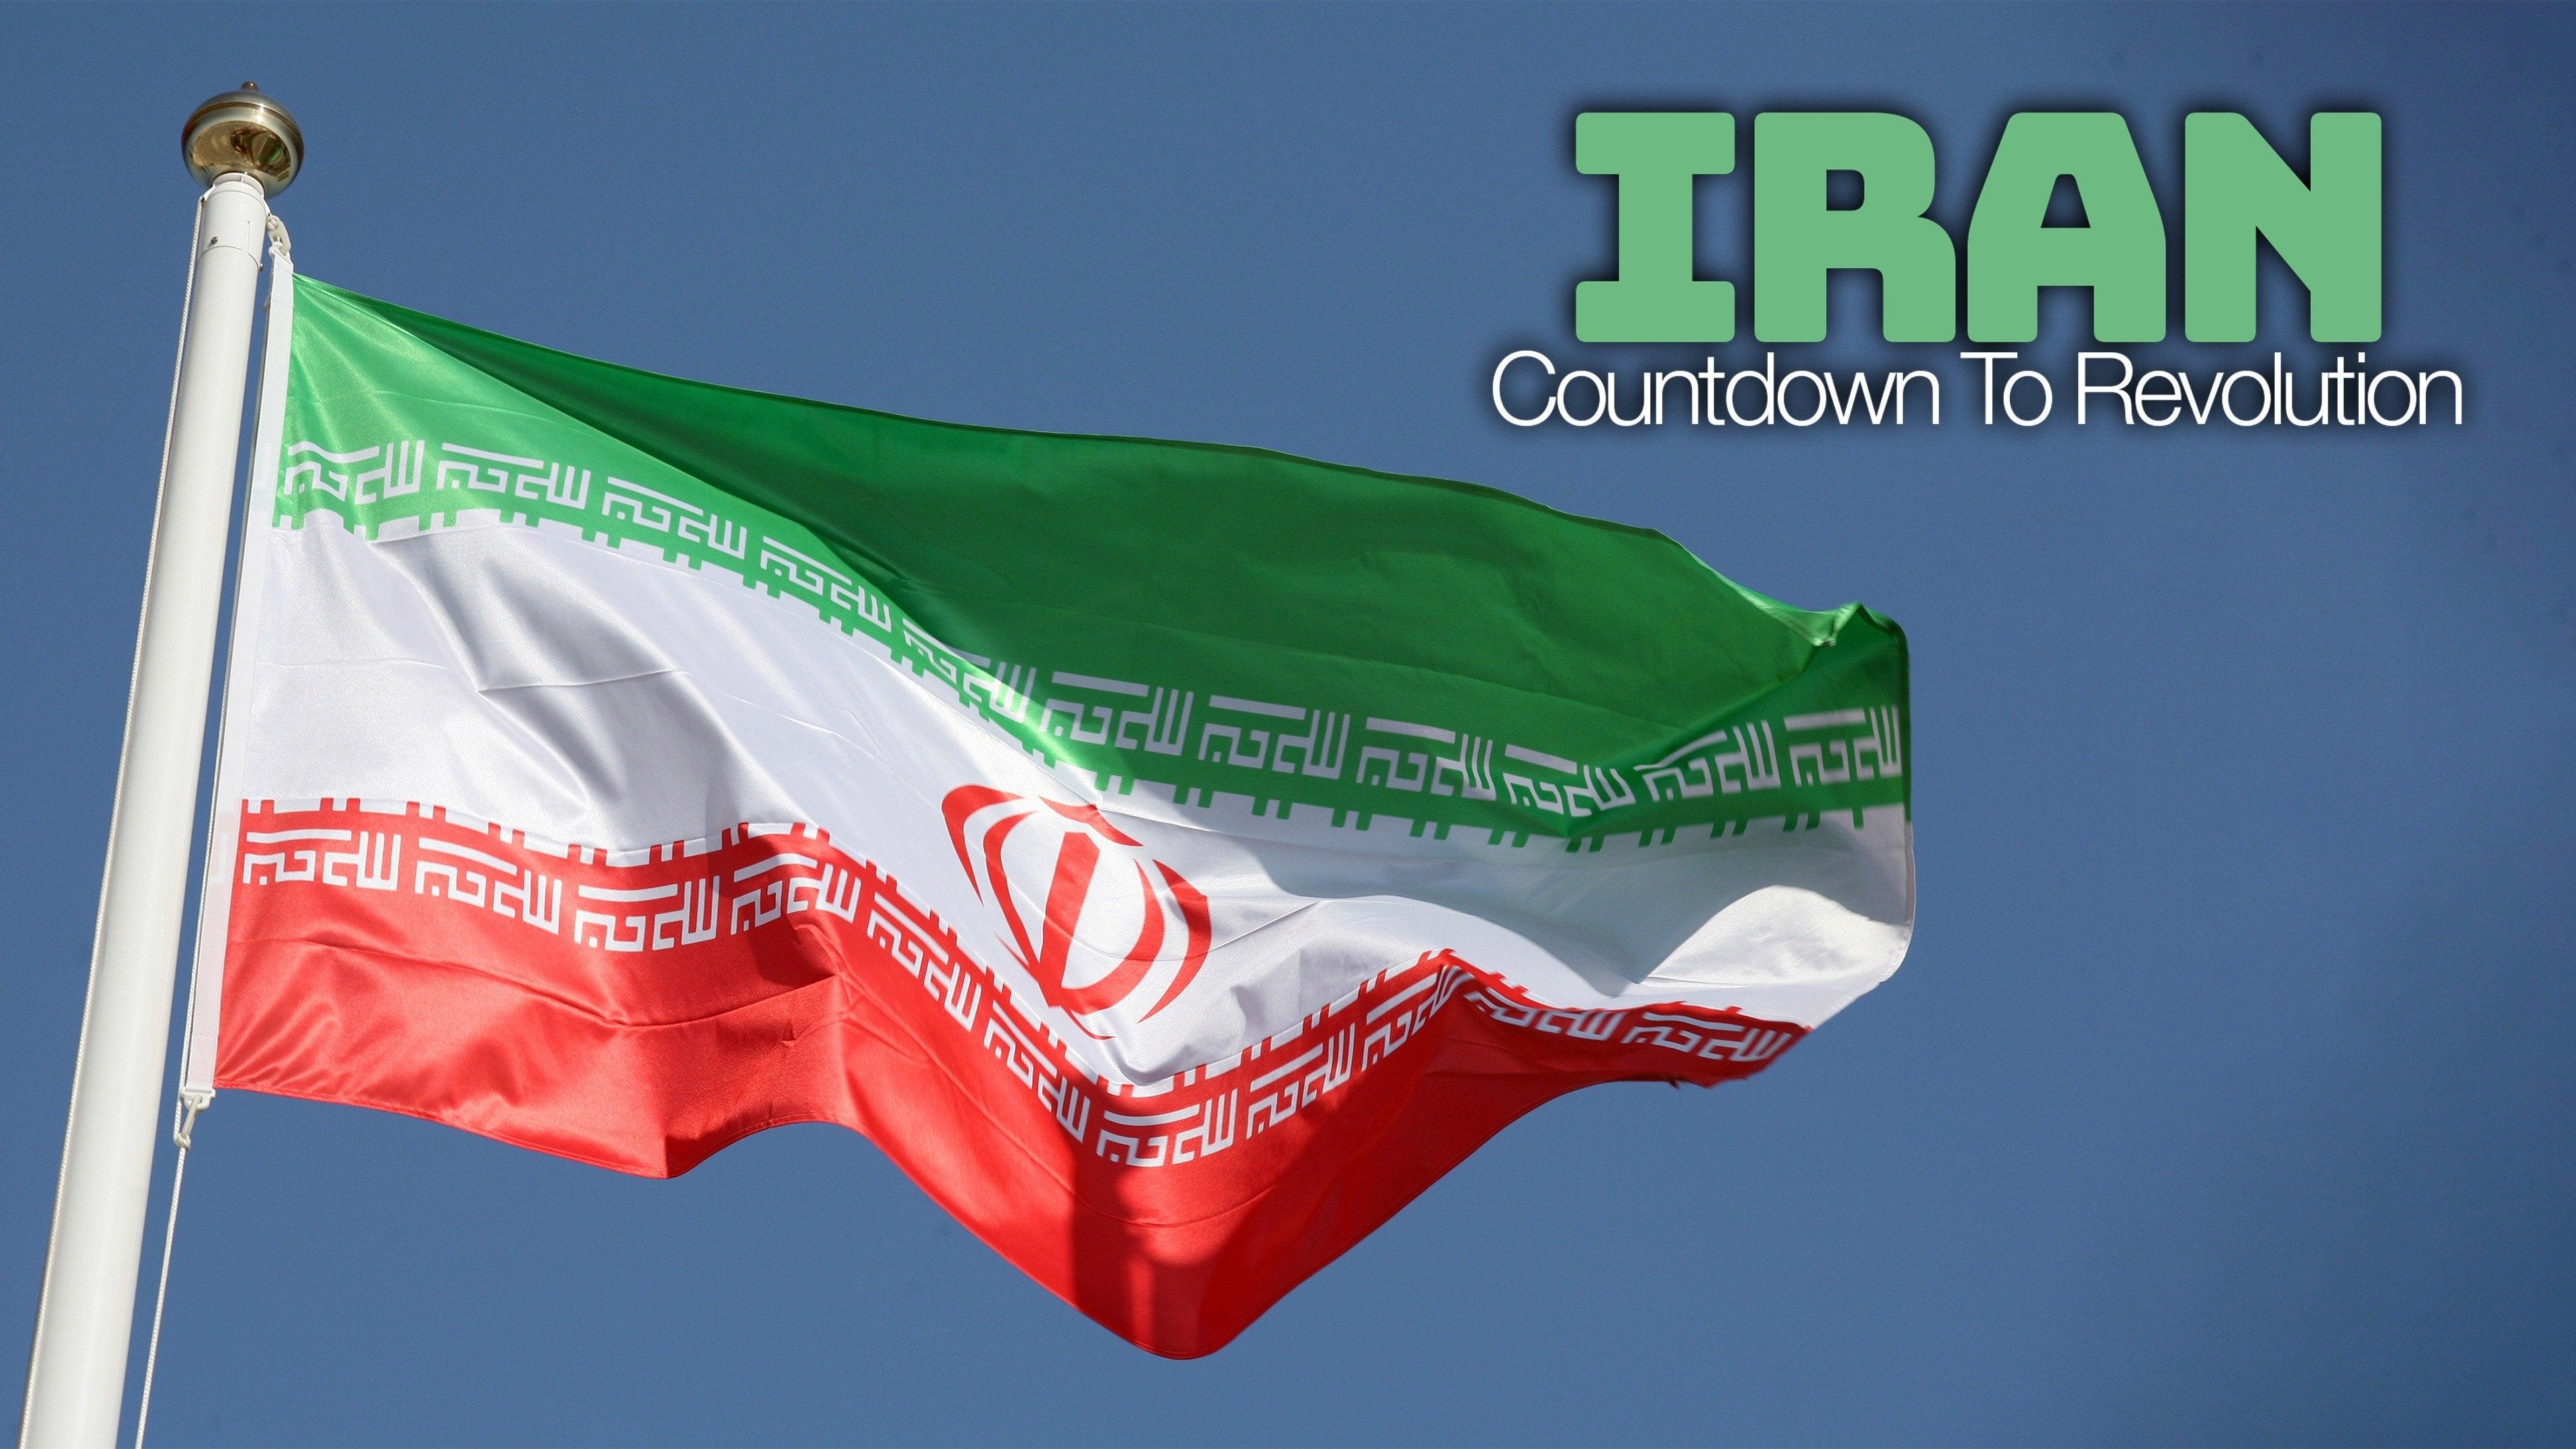 Iran: Countdown To Revolution